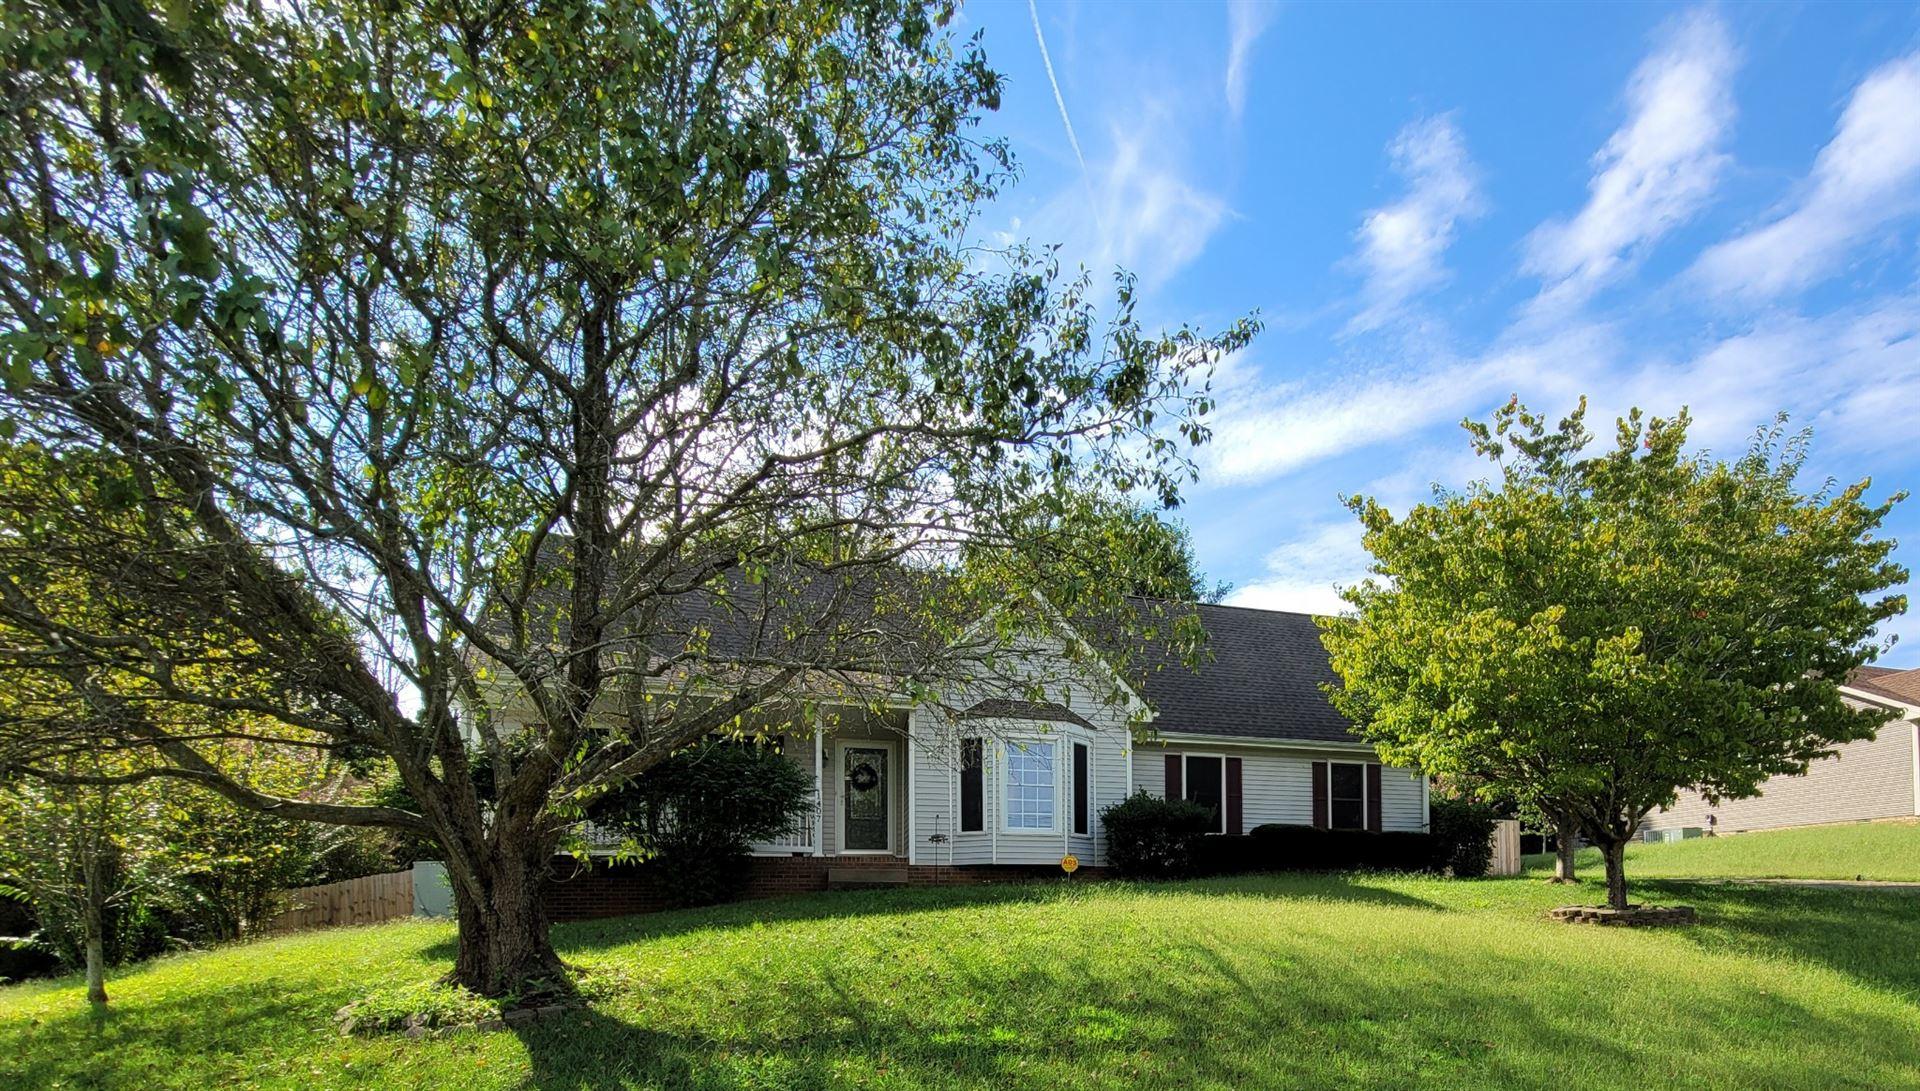 1407 McClardy Rd, Clarksville, TN 37042 - MLS#: 2221256